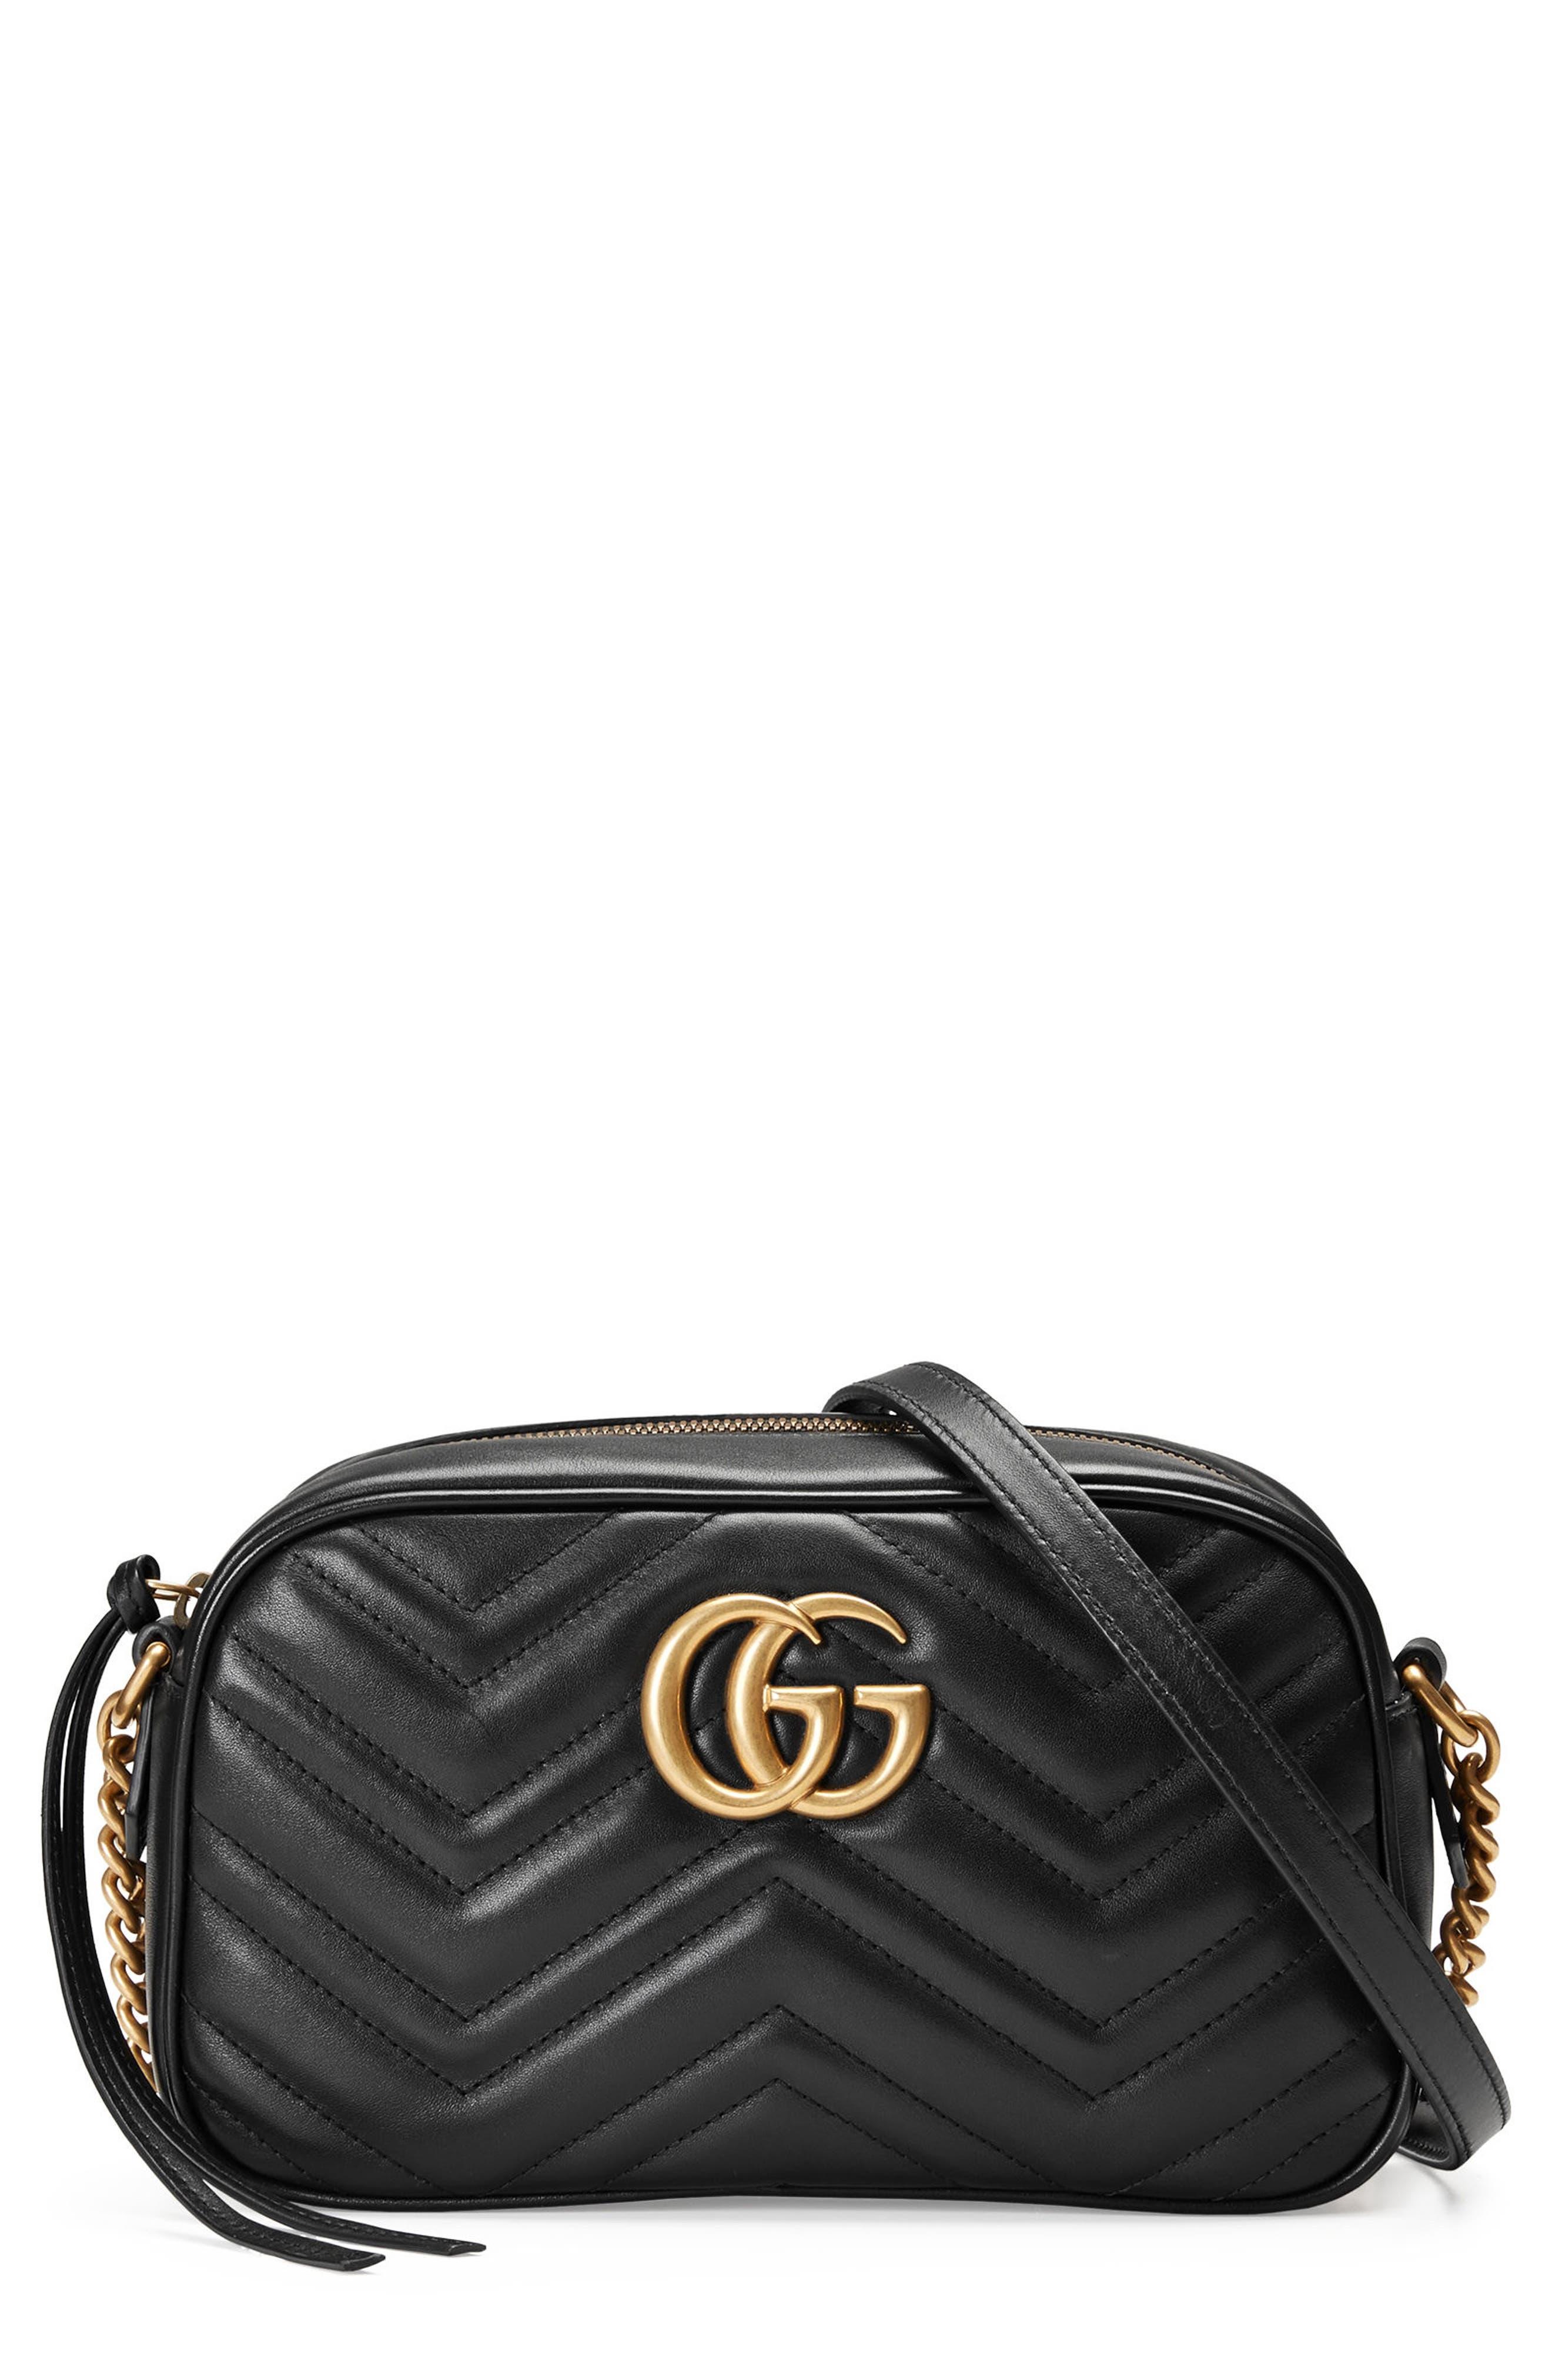 GUCCI GG Marmont 2.0 Matelassé Leather Camera Bag, Main, color, 001